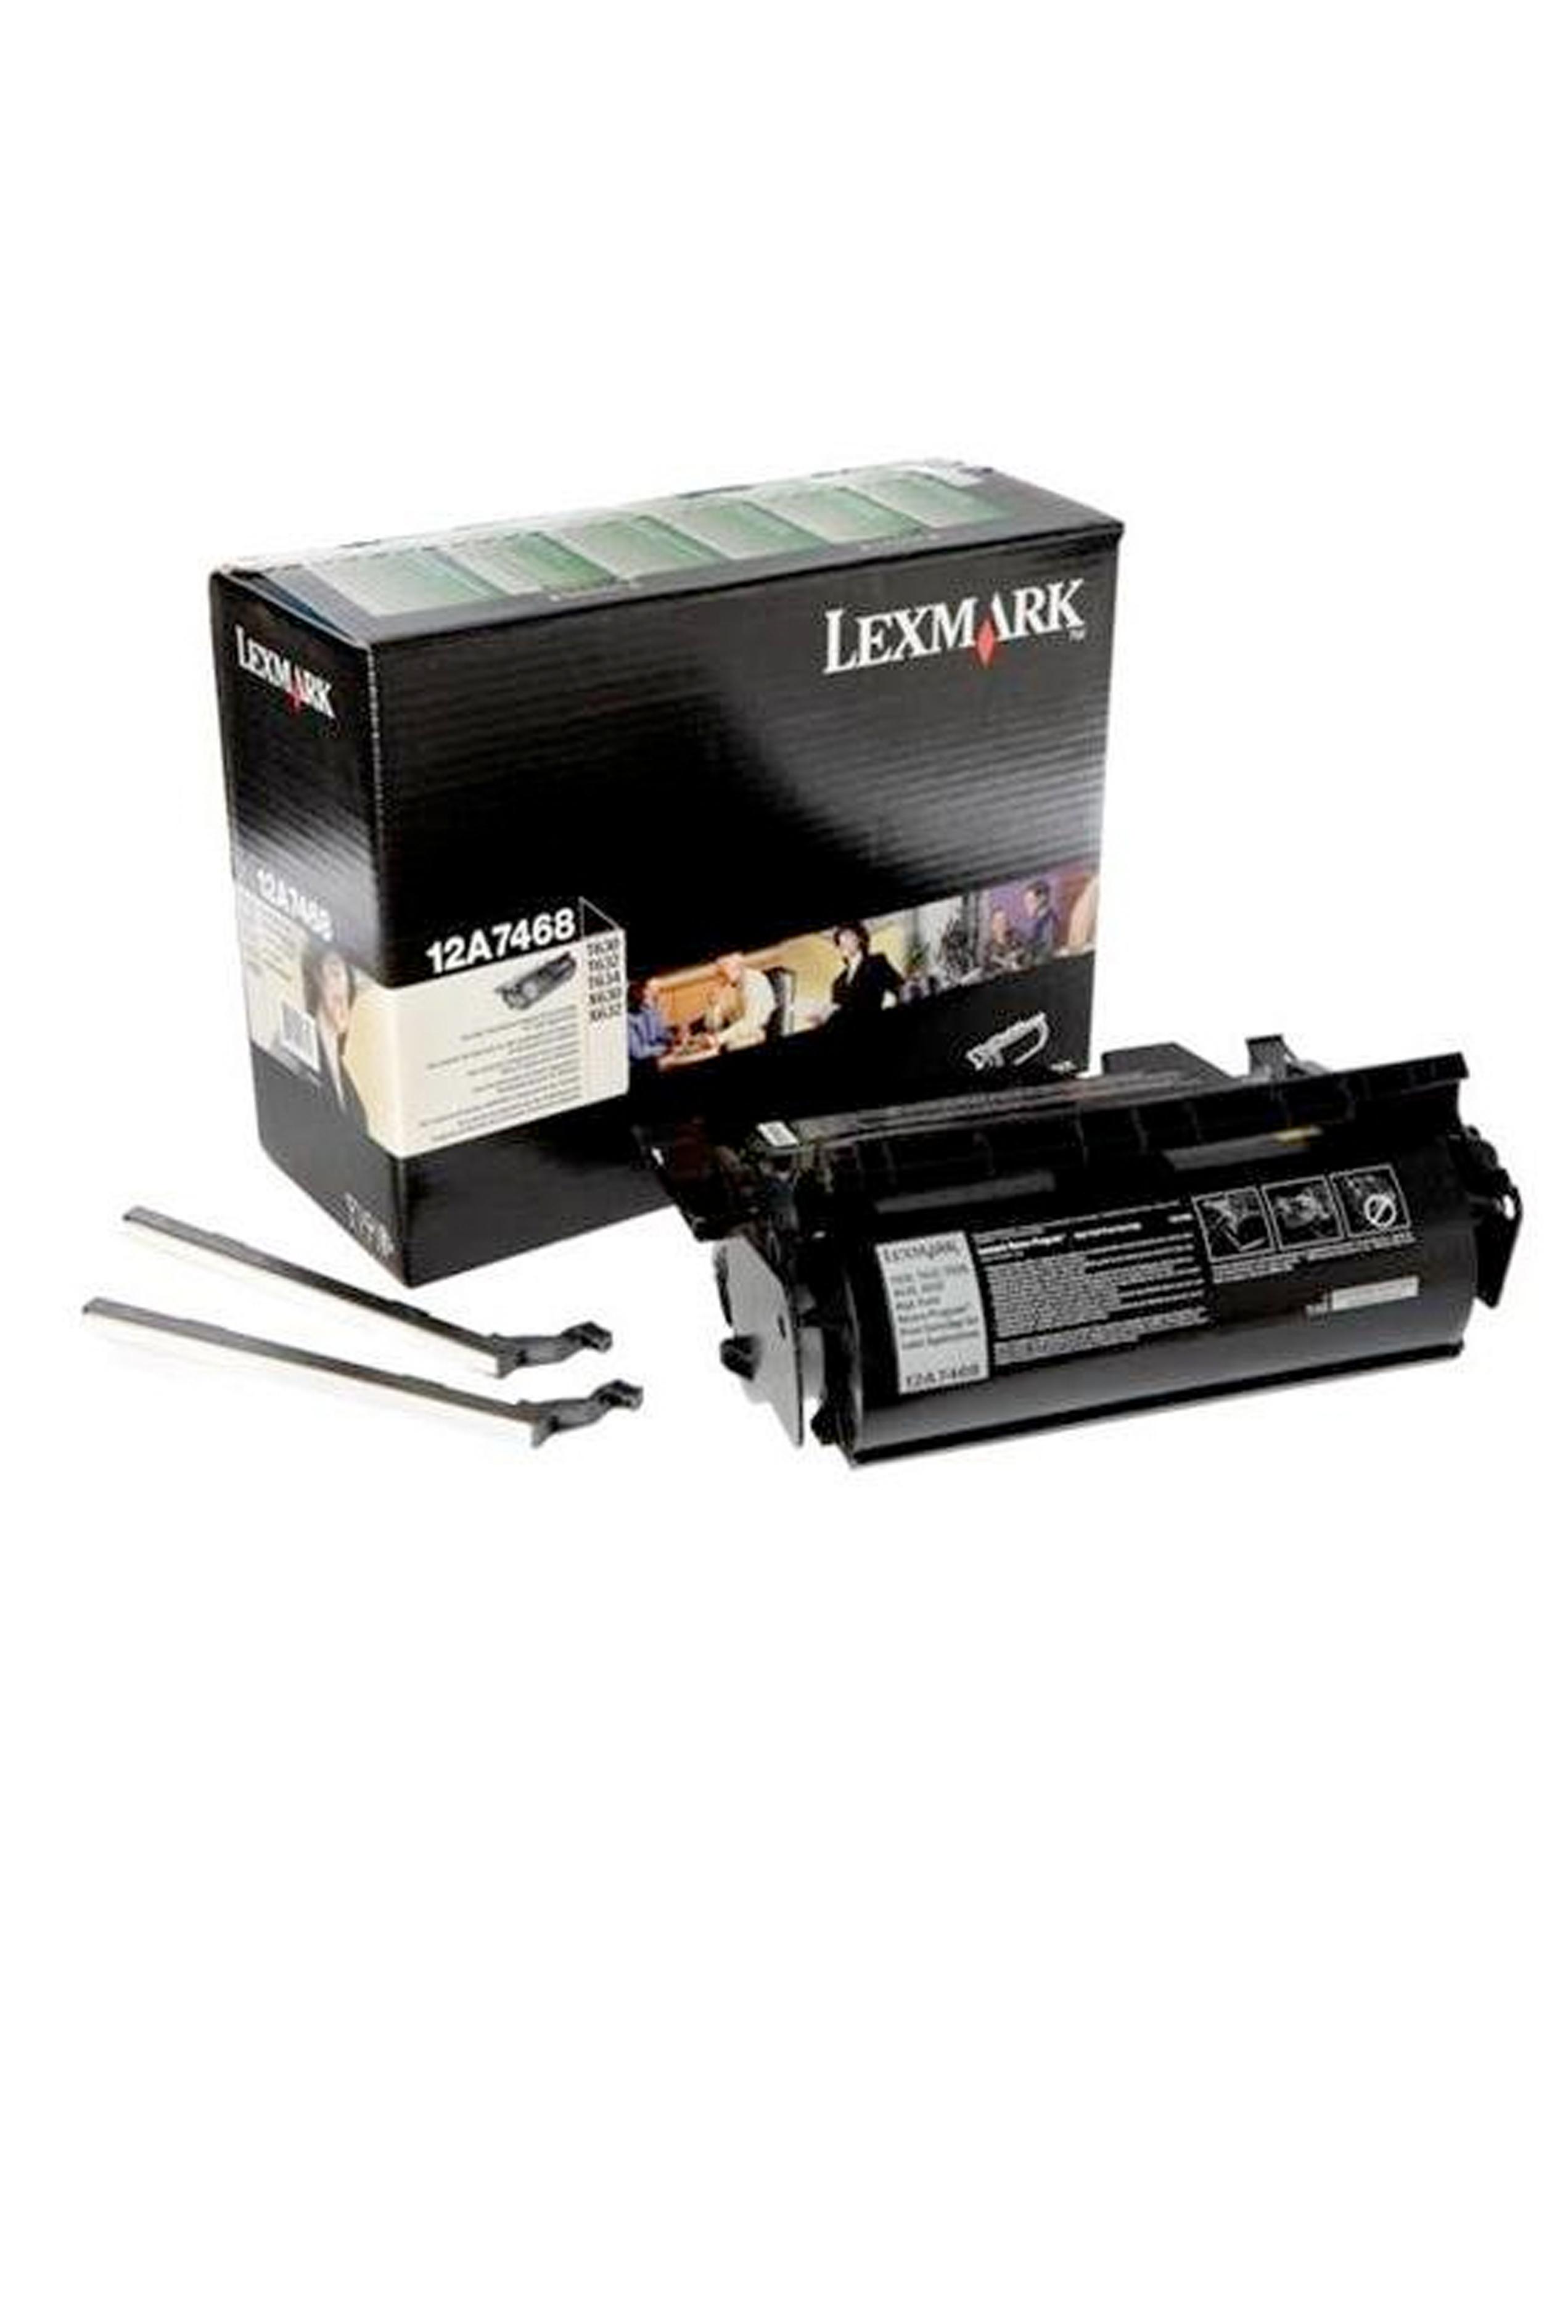 Lexmark LEXMARK 21K @ 5% RETURN PROG PRINT CARTRIDGES (LABELS) (12A7468)